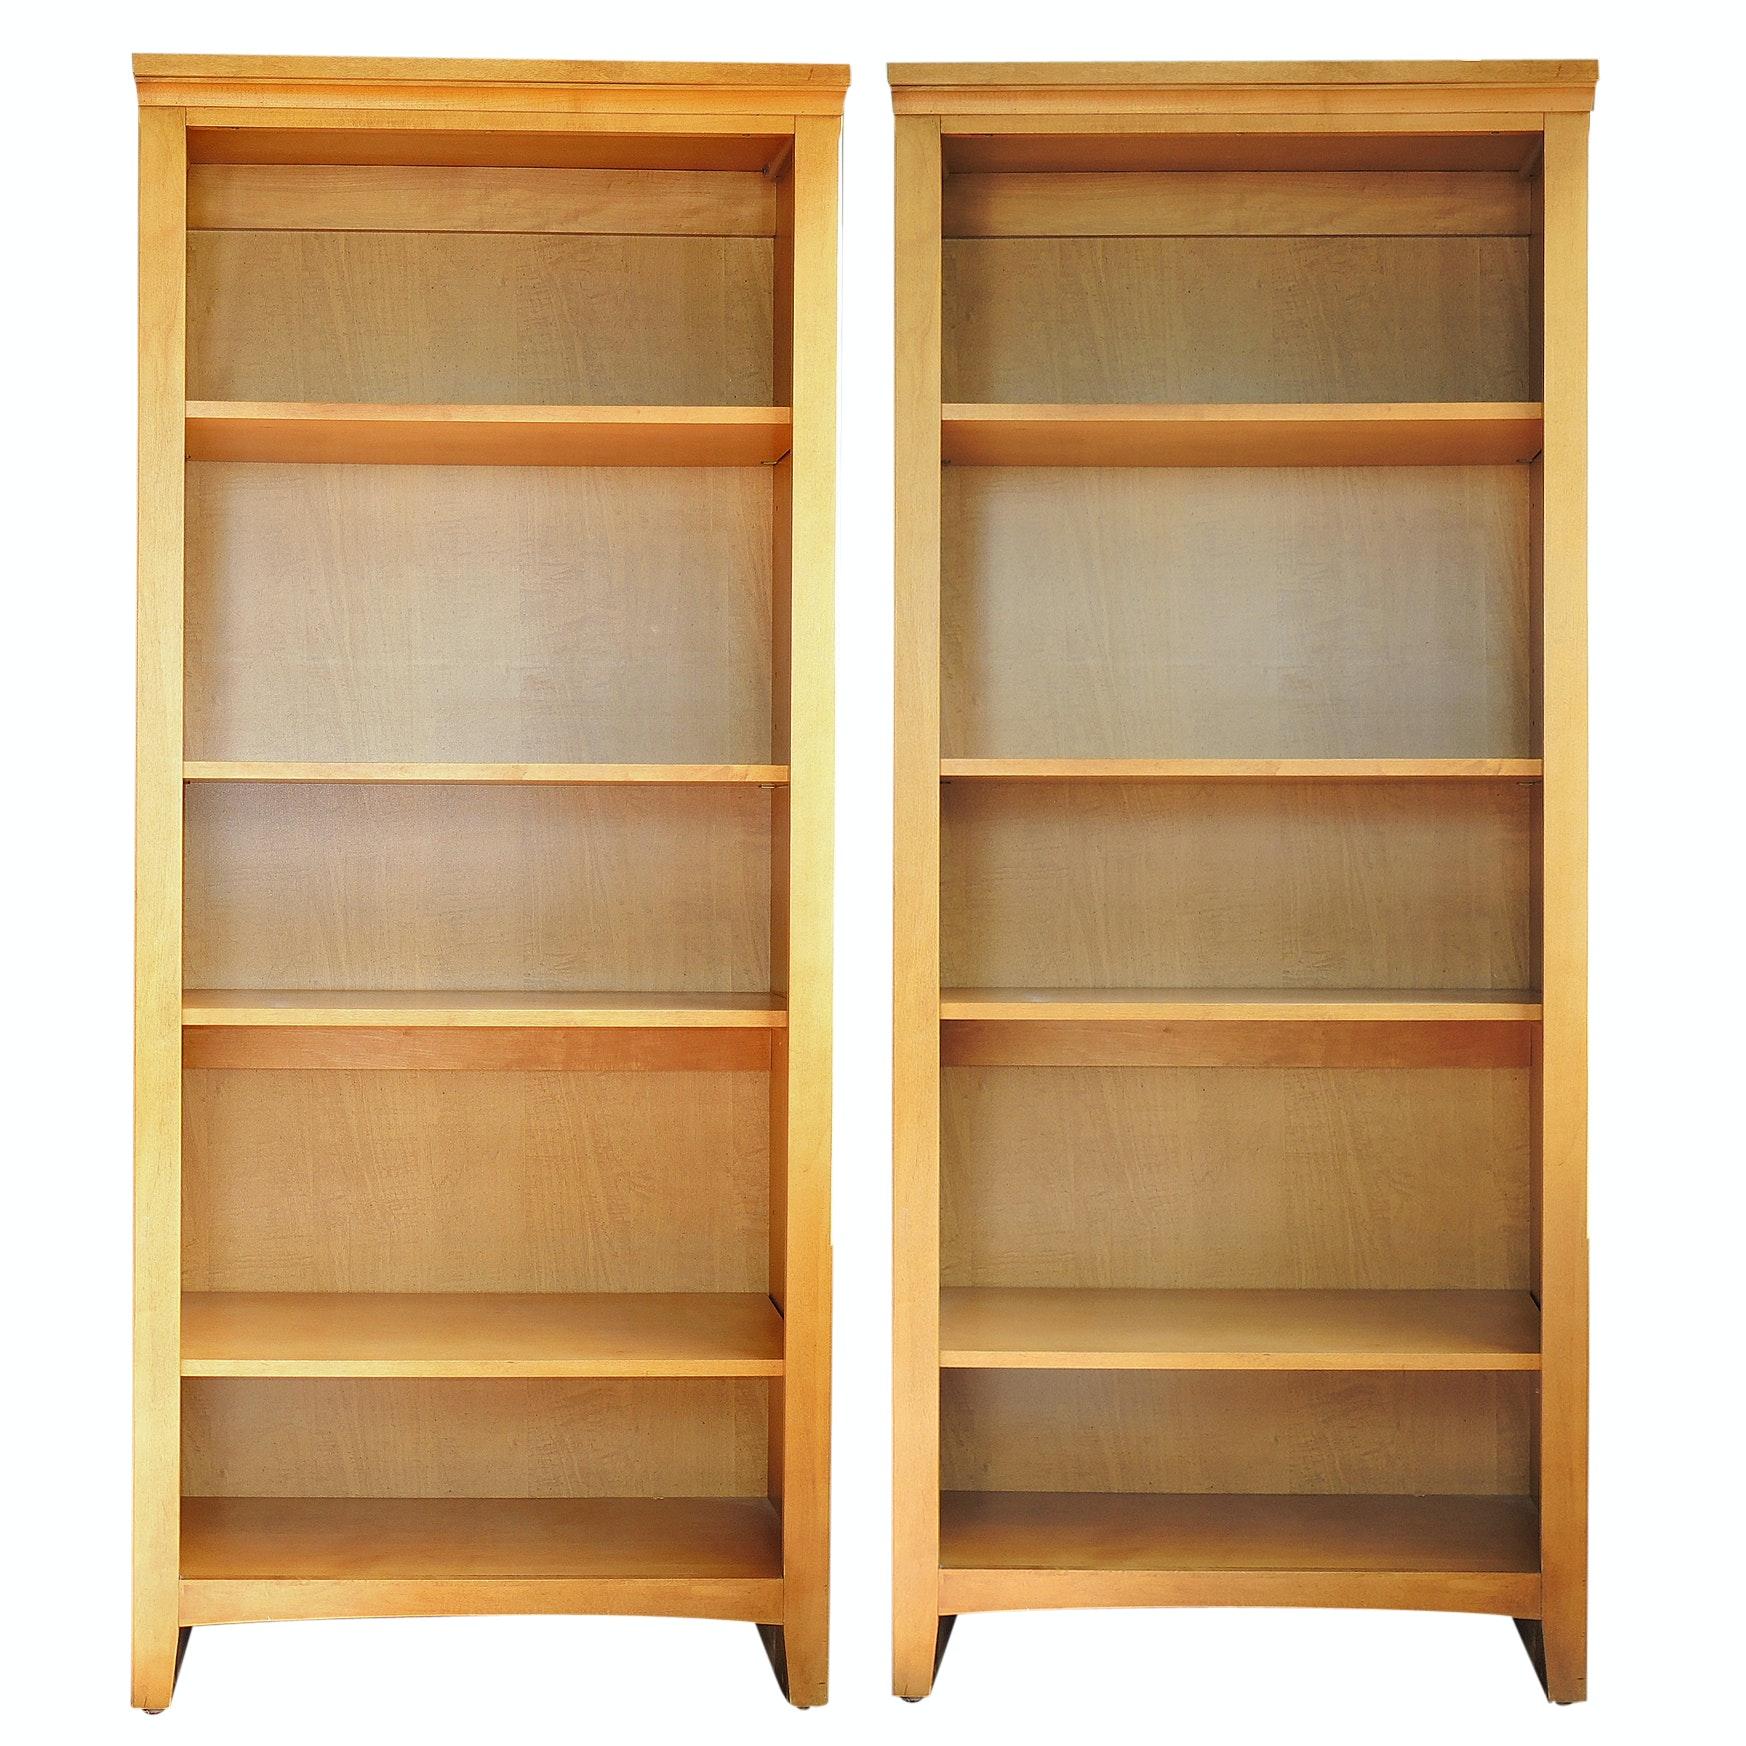 Contemporary Adjustable Shelf Bookcases